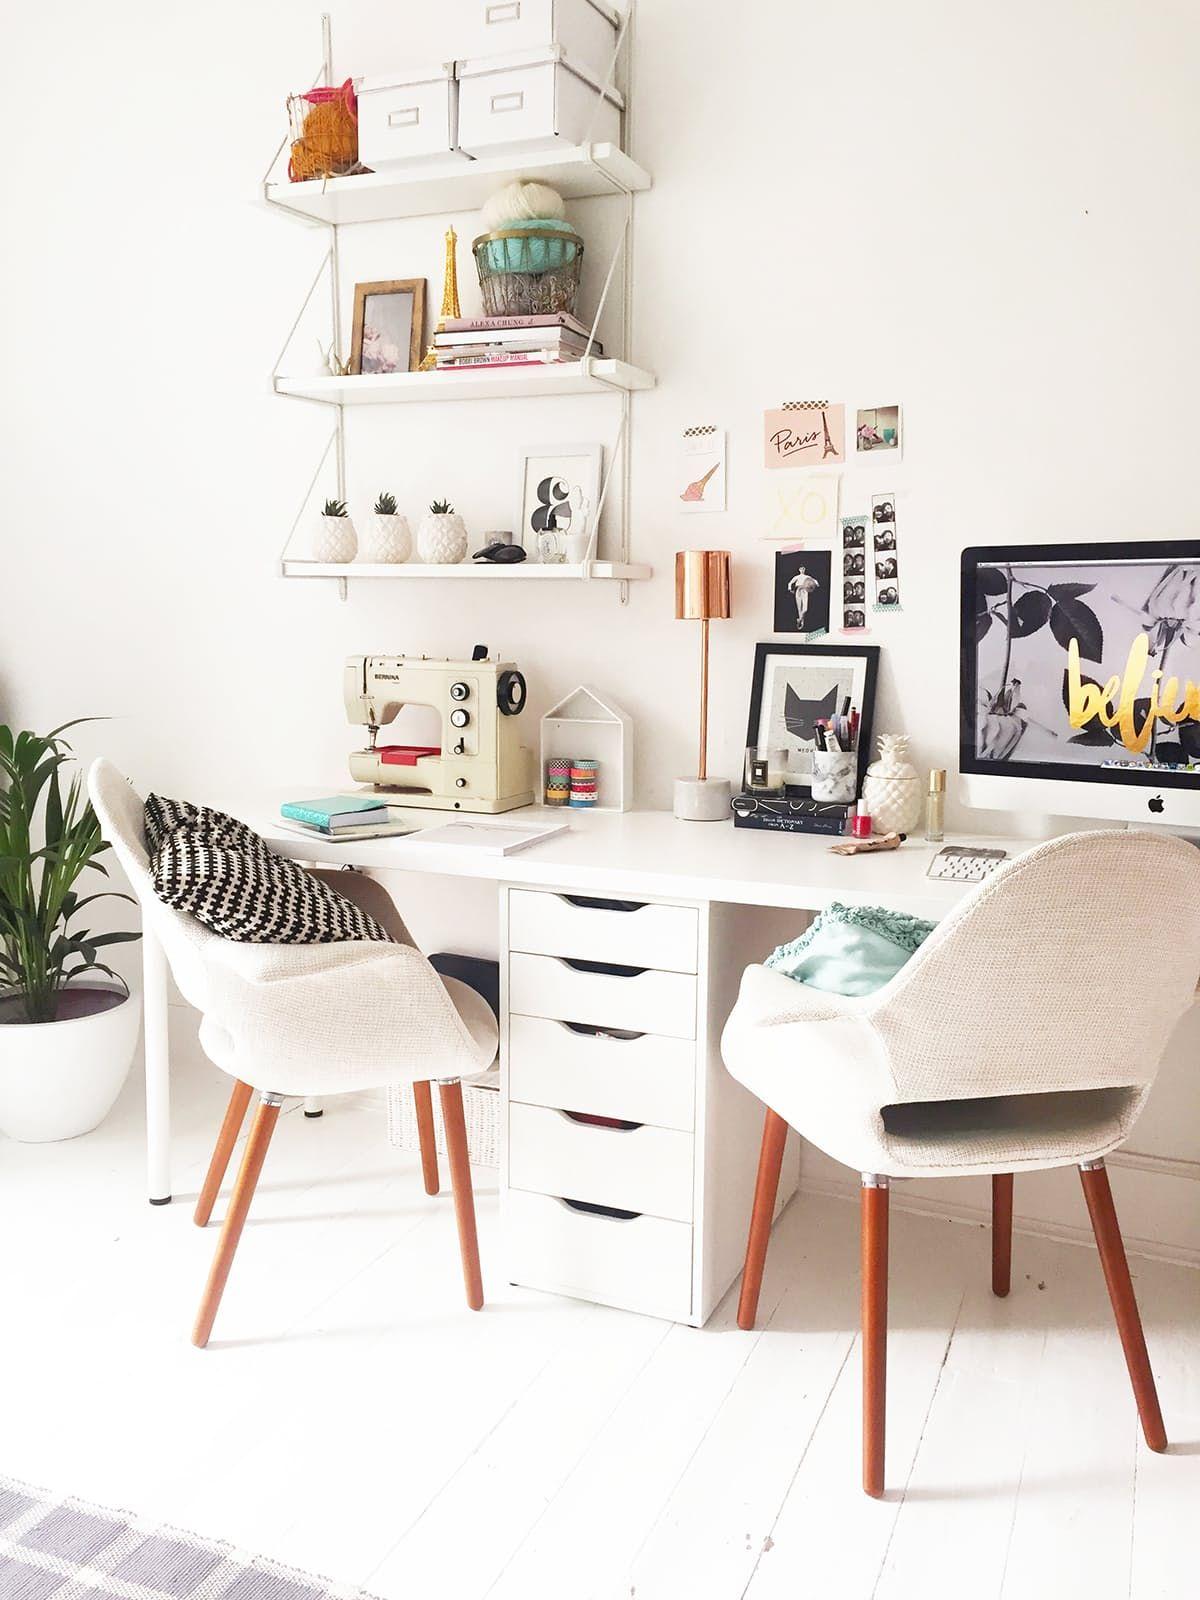 Buy or DIY Smart and Stylish Wall